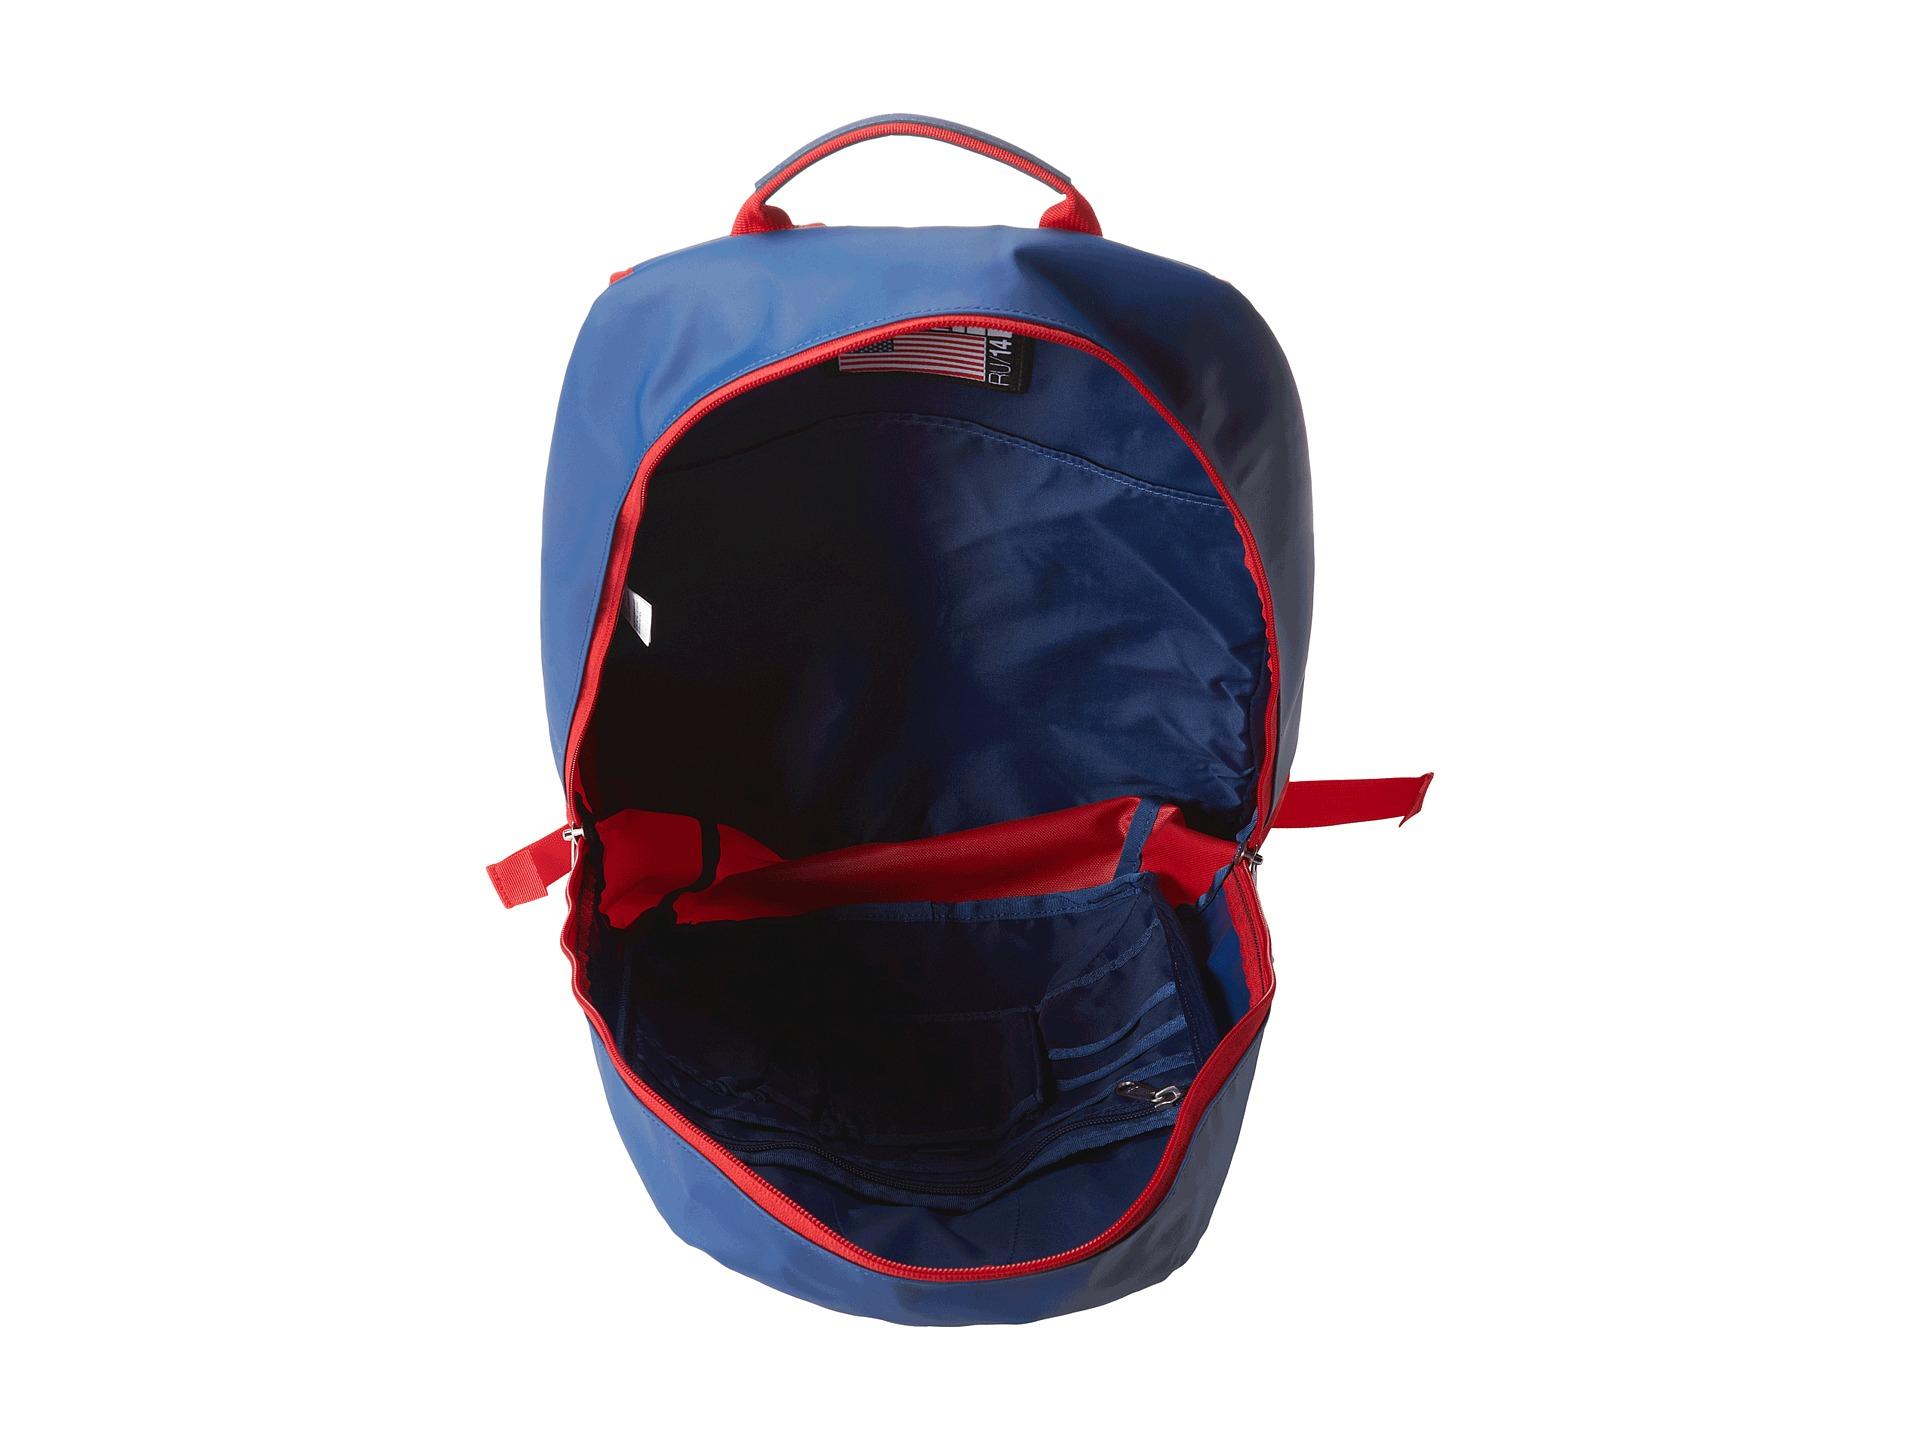 40903e2b5 Lyst - The North Face International Base Camp Crimp in Blue for Men